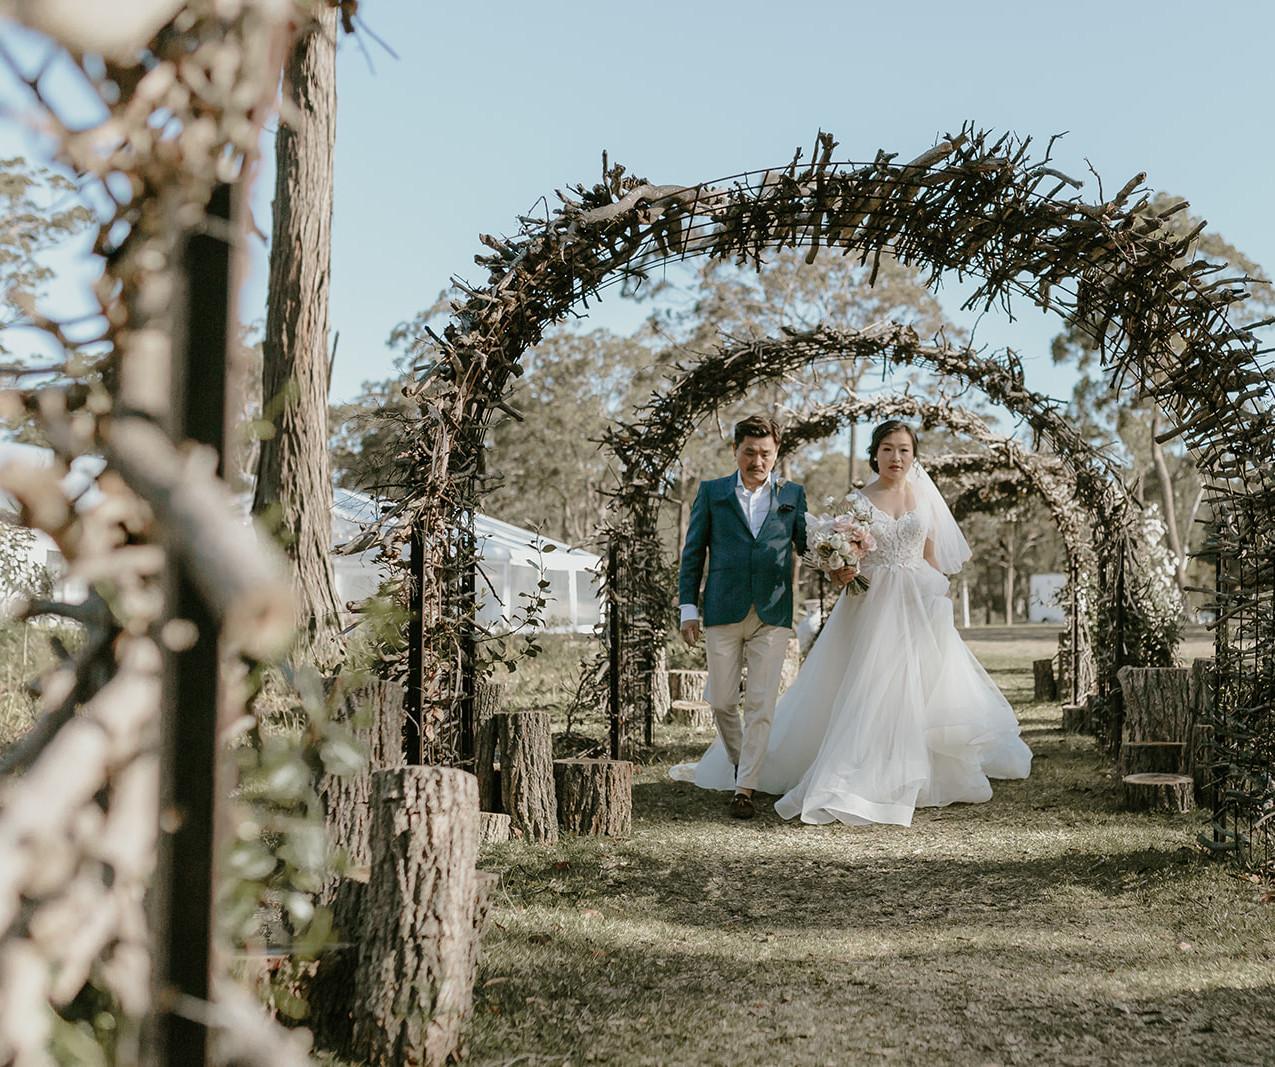 Sydney Wedding Photographers  Photography: Zoe Morley Photography